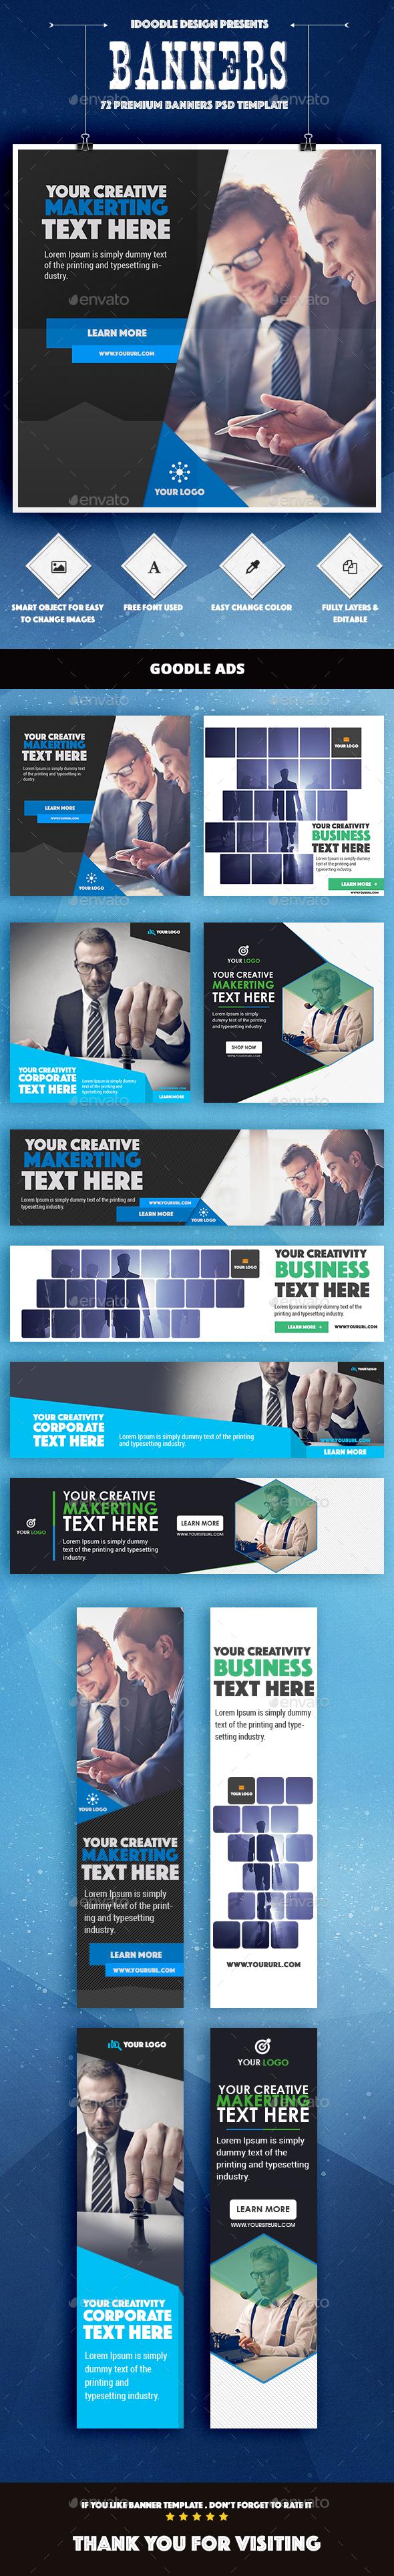 Bundle Multipurpose Banner Ad - Banners & Ads Web Elements